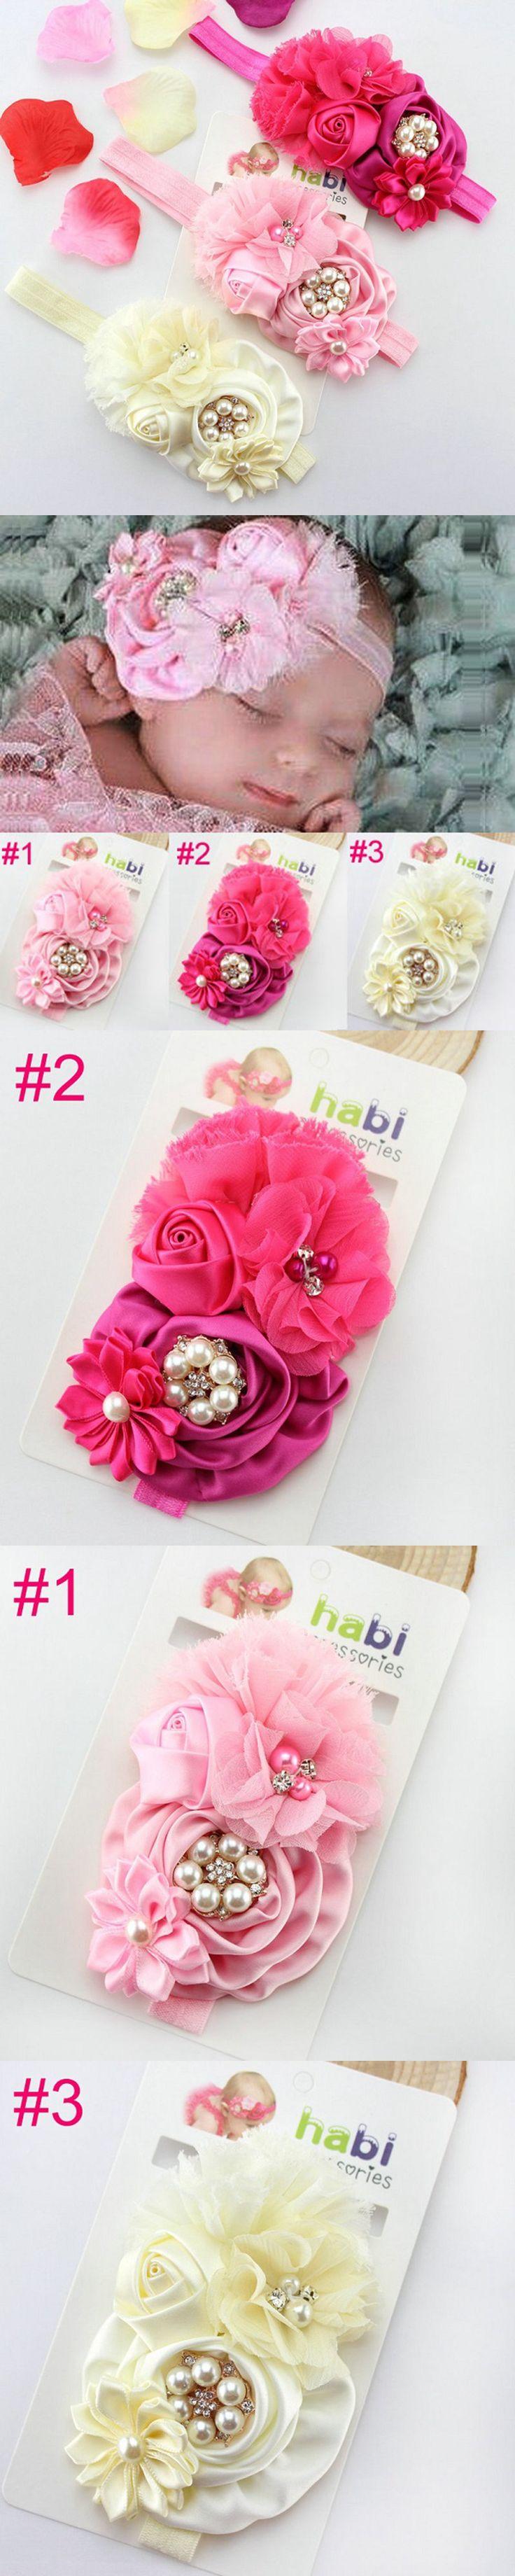 Infant Baby big Rose Flower Headband Baby Girls Rhinestone and Pearl Chiffon Flower Headband Children Hair Accessories 1pc HB004